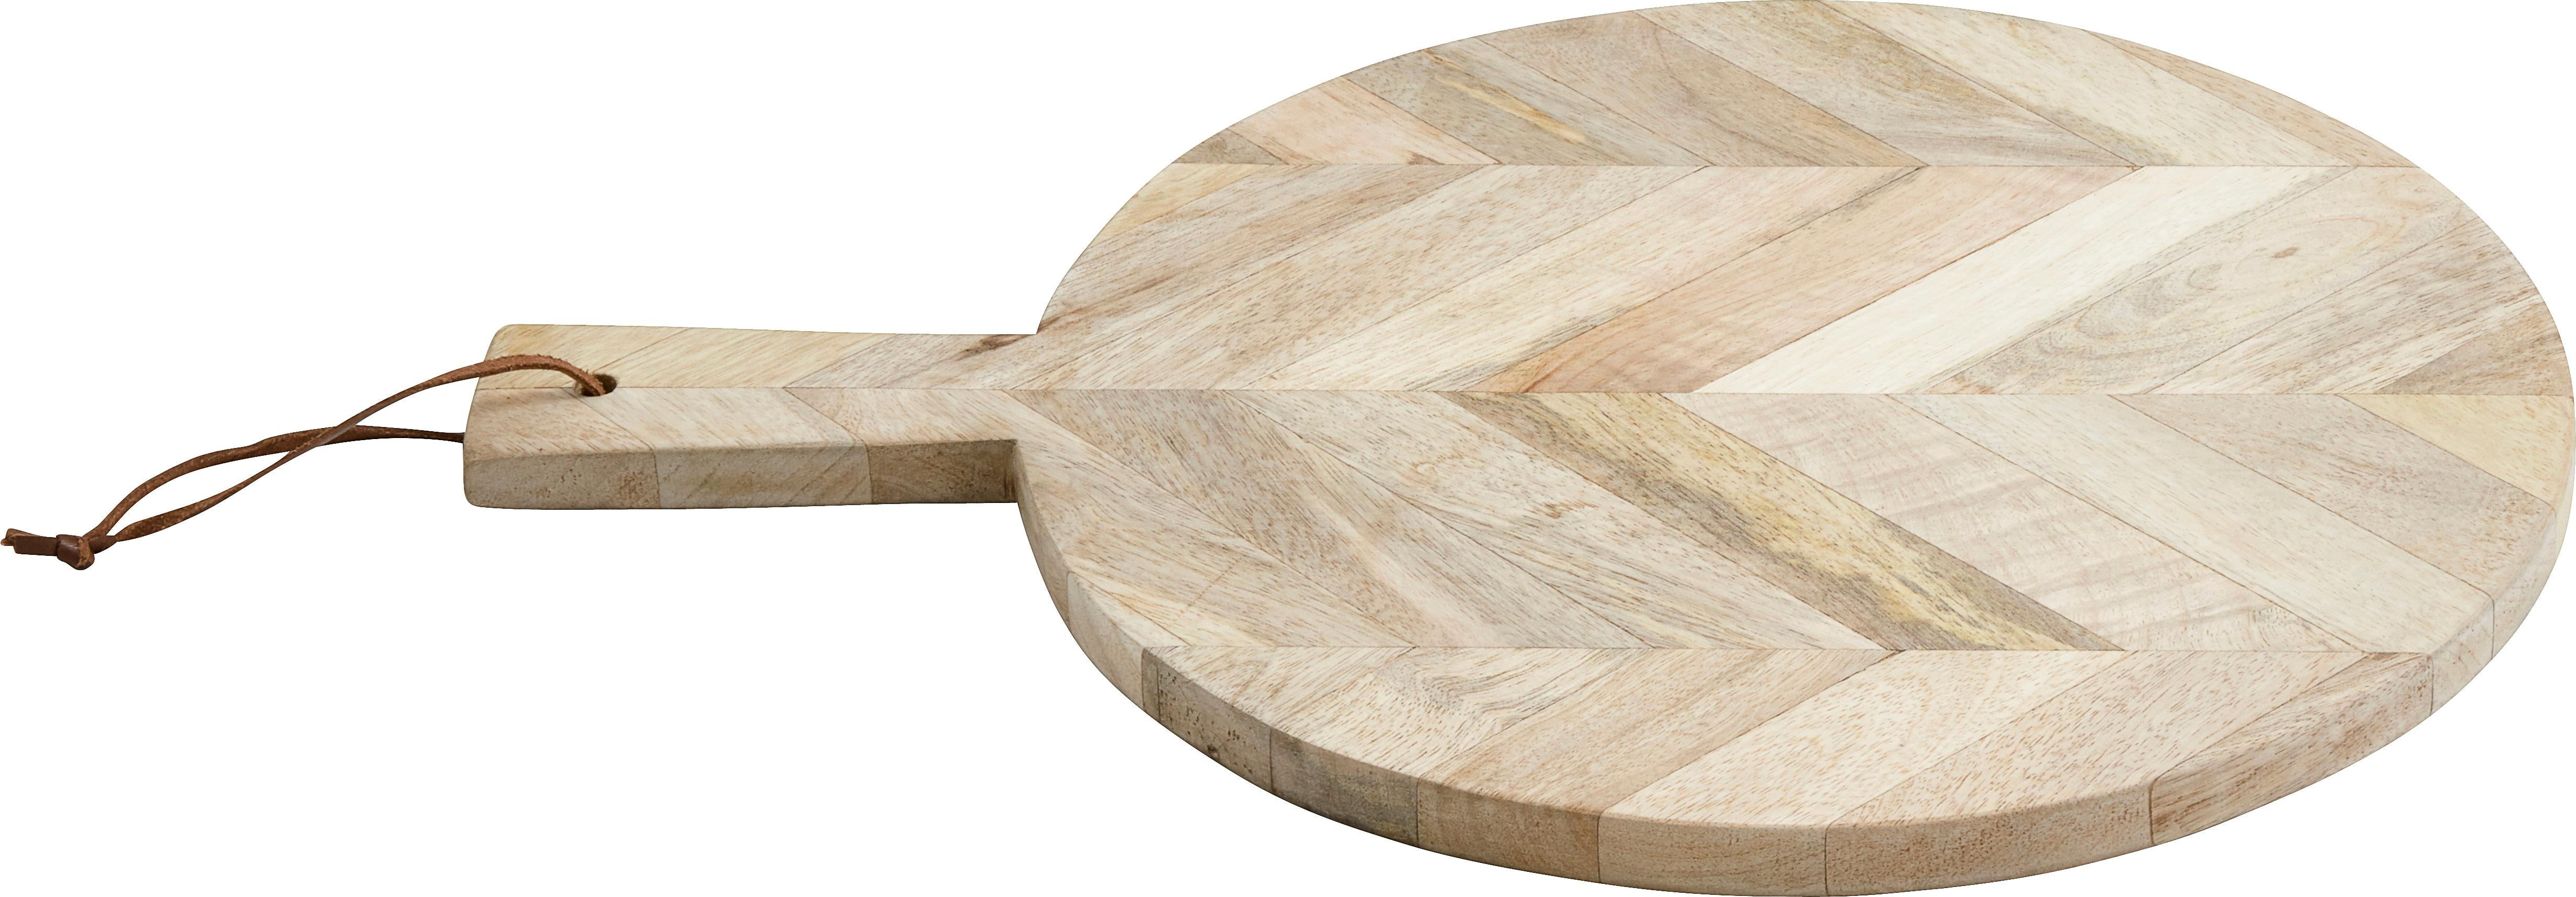 Deska do krojenia Herringbone, Drewno mangowe, skóra, Drewno mangowe, S 43 x G 32 cm